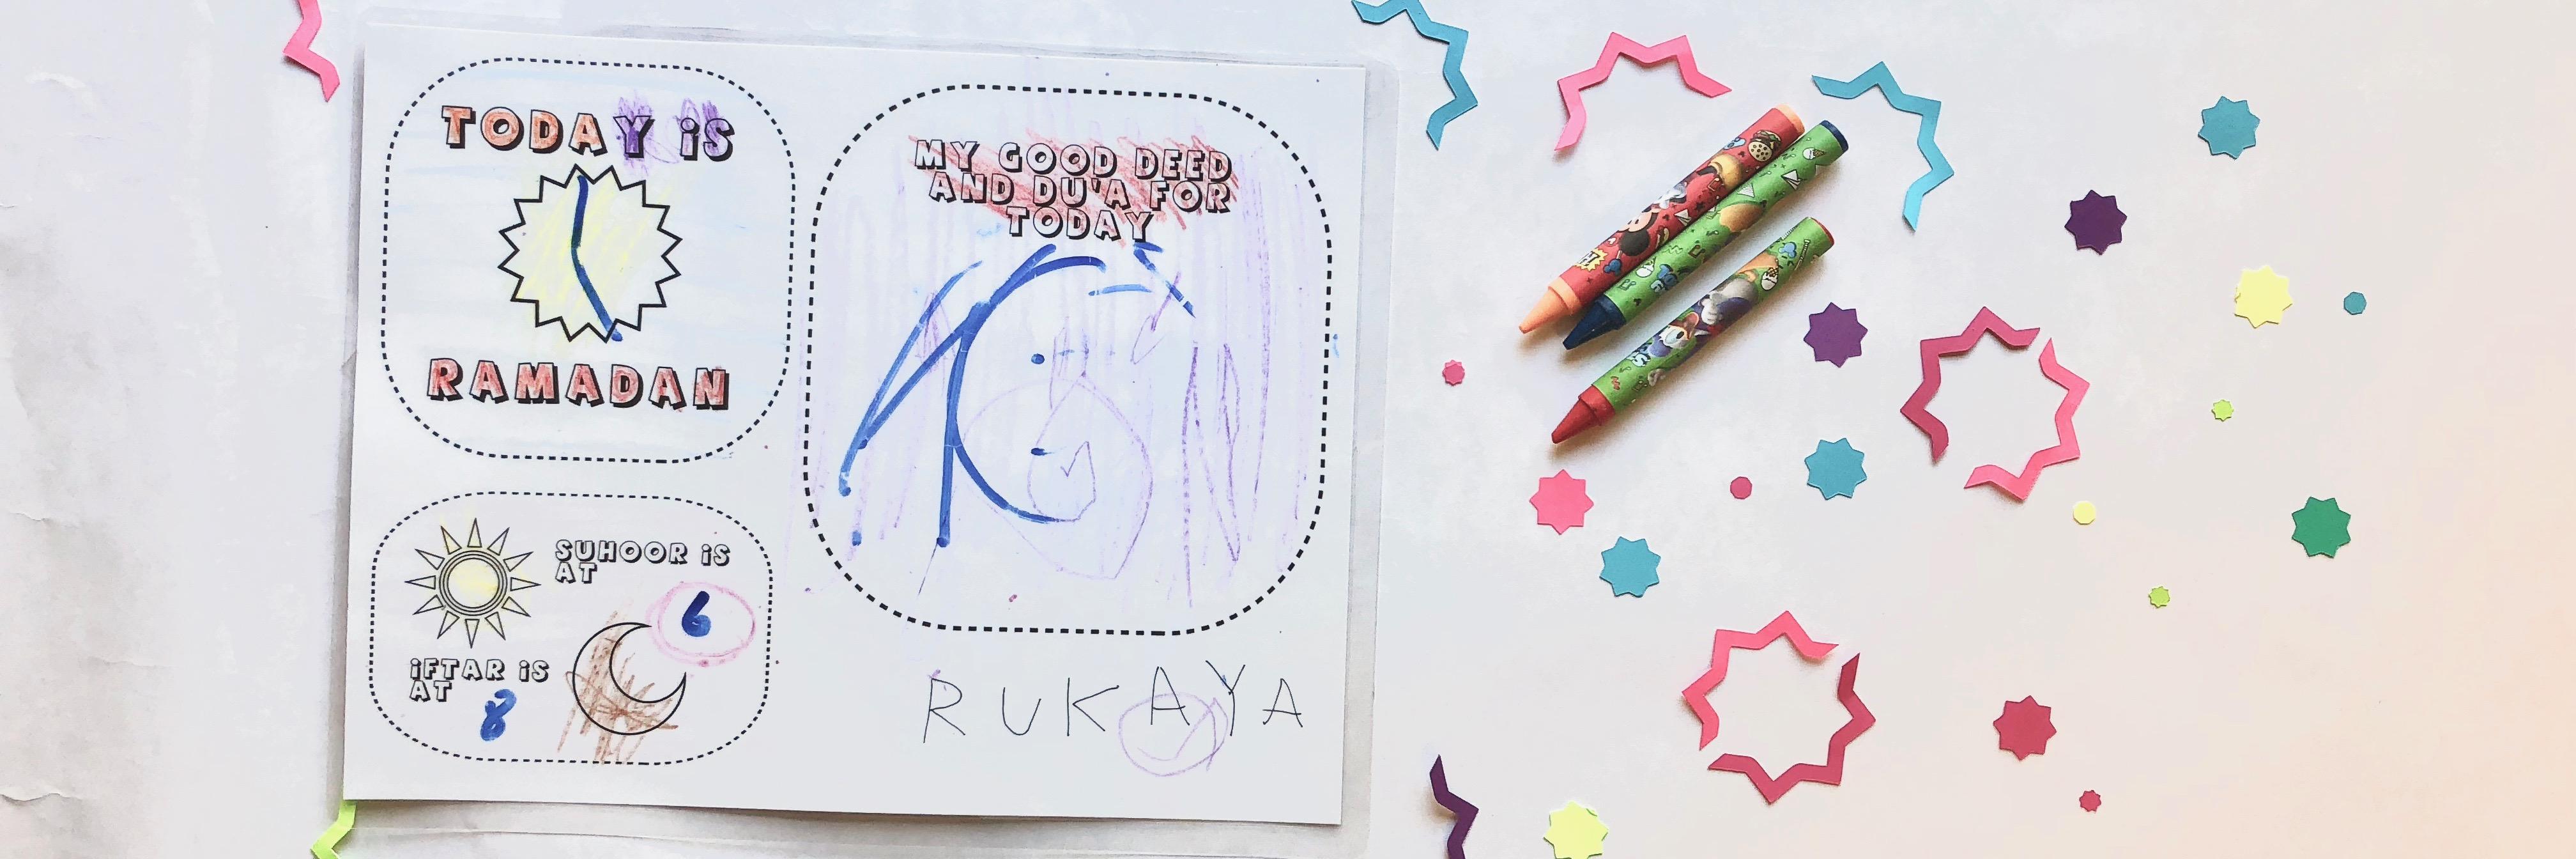 FREE DIY Placemat Printable | Ramadan Mubarak!